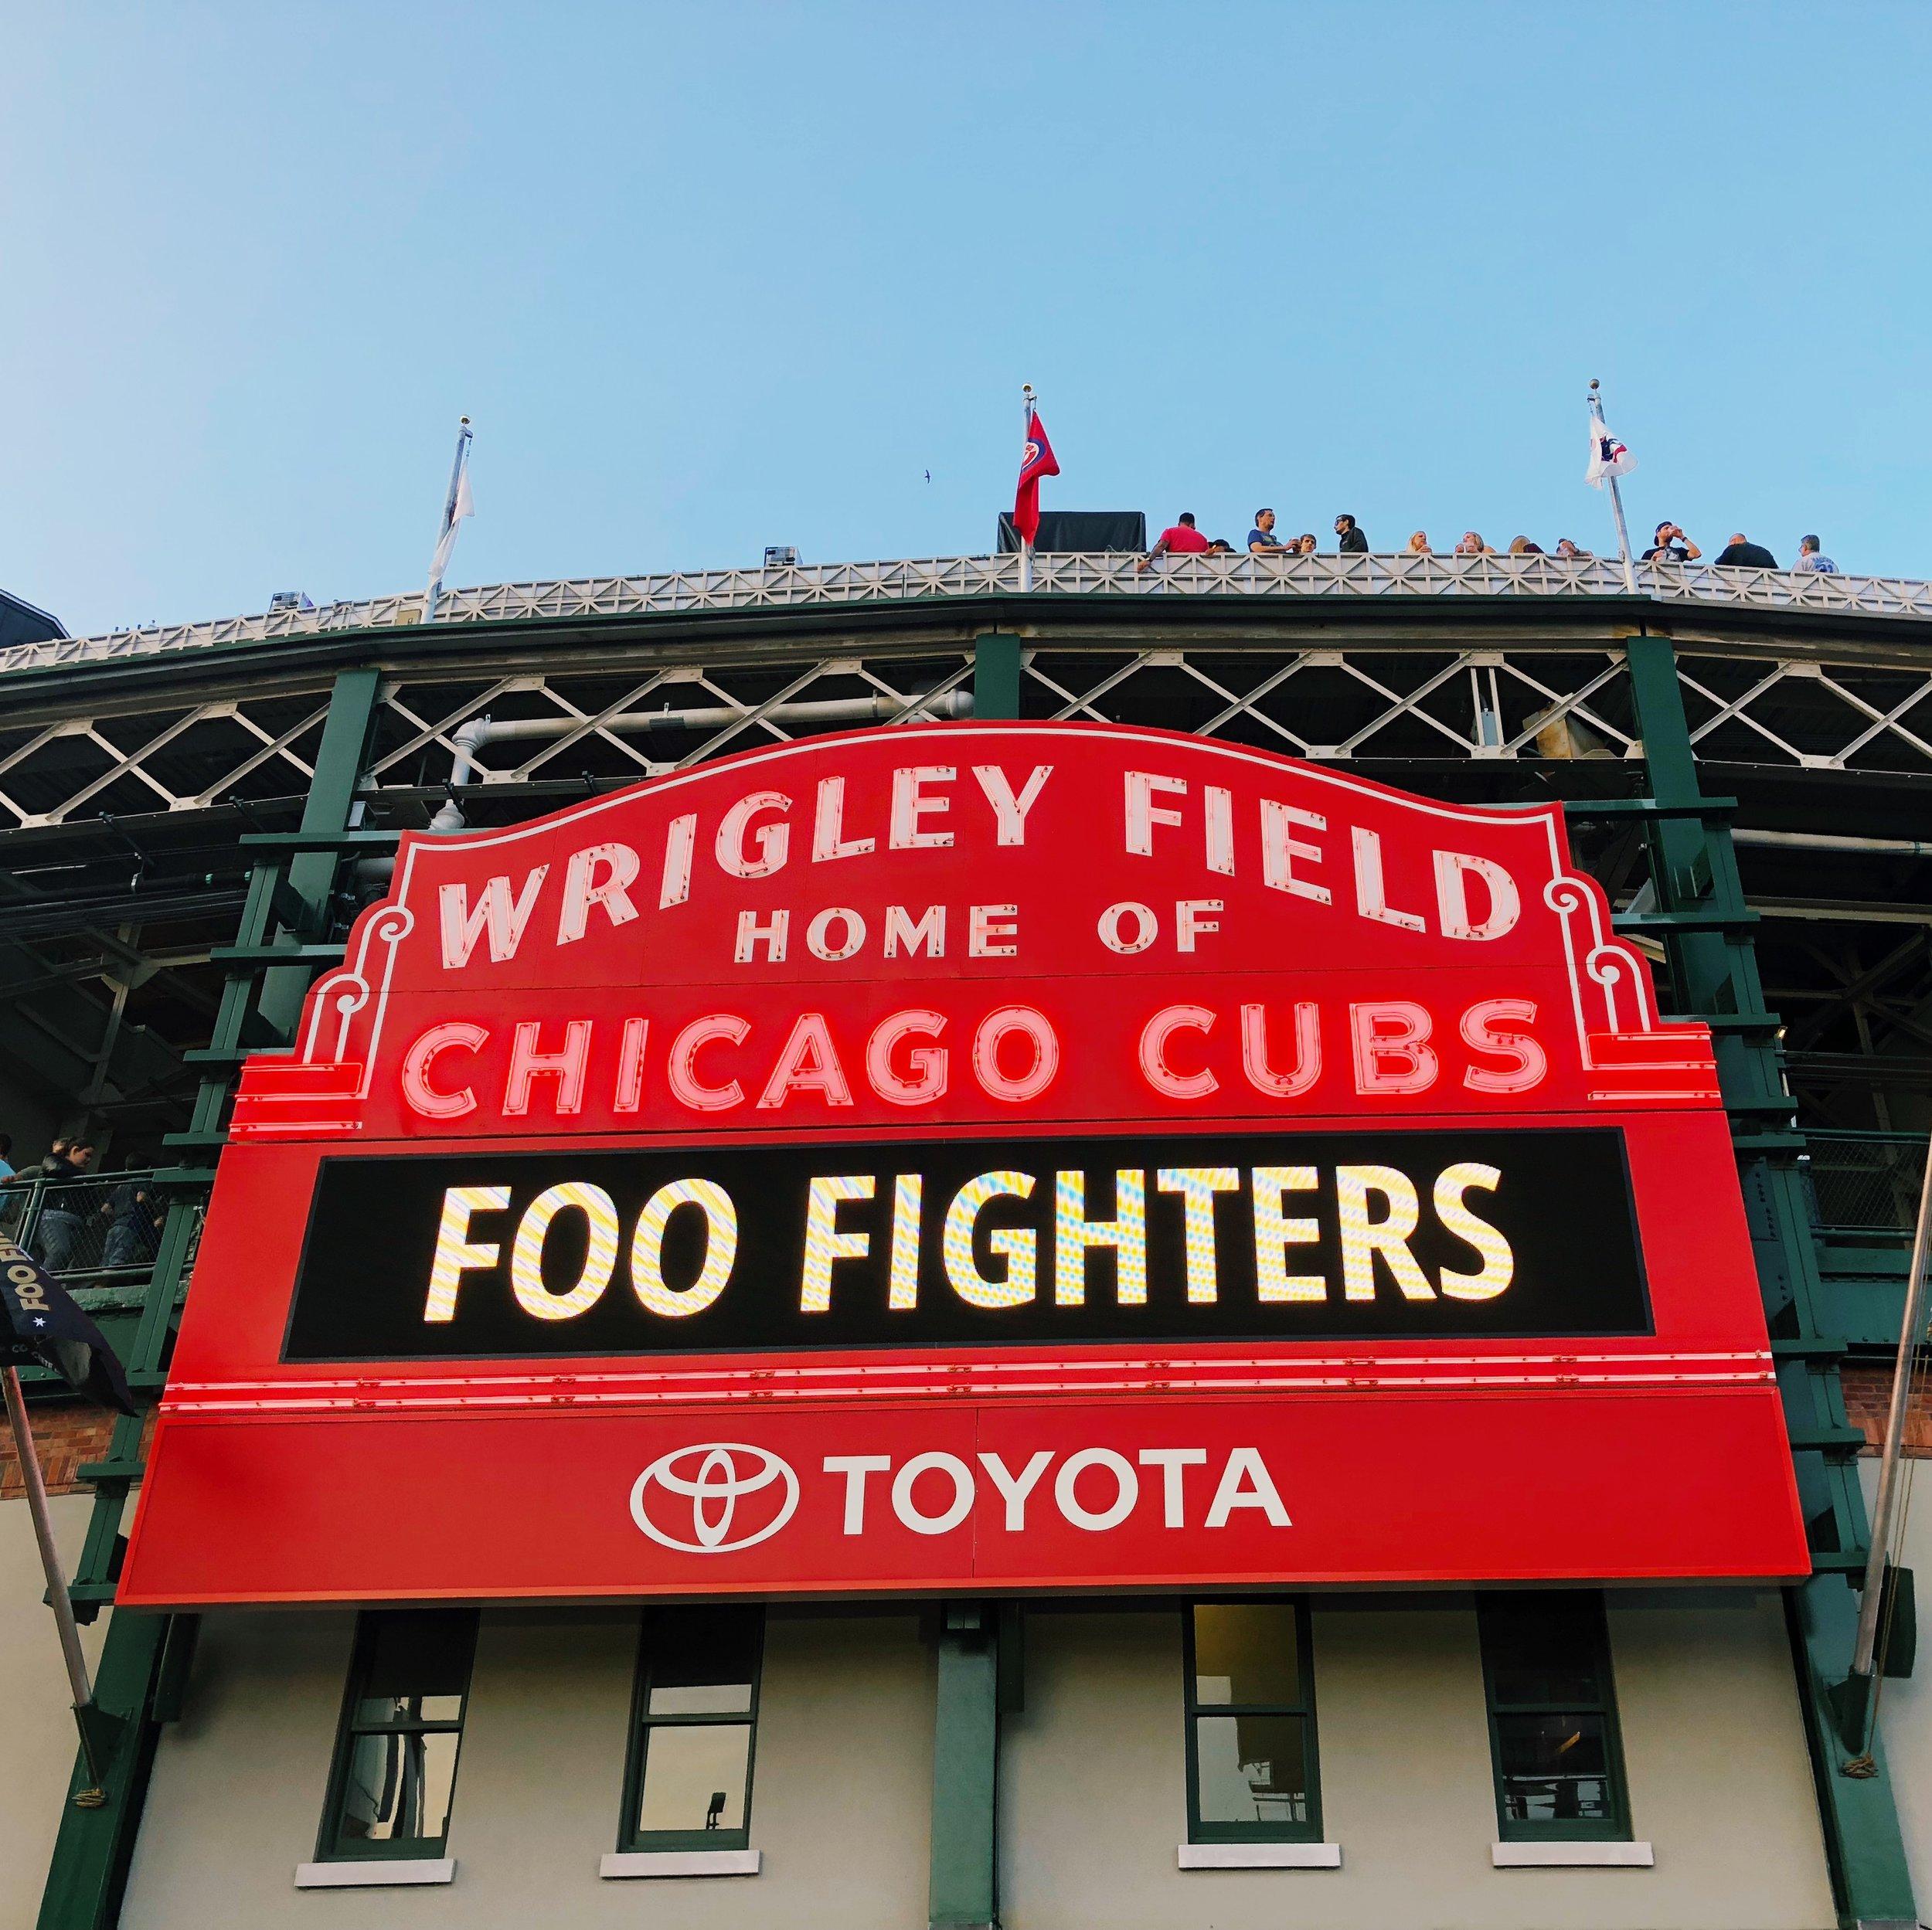 Foo-fighters-Wrigley-field-chicago-5.jpg